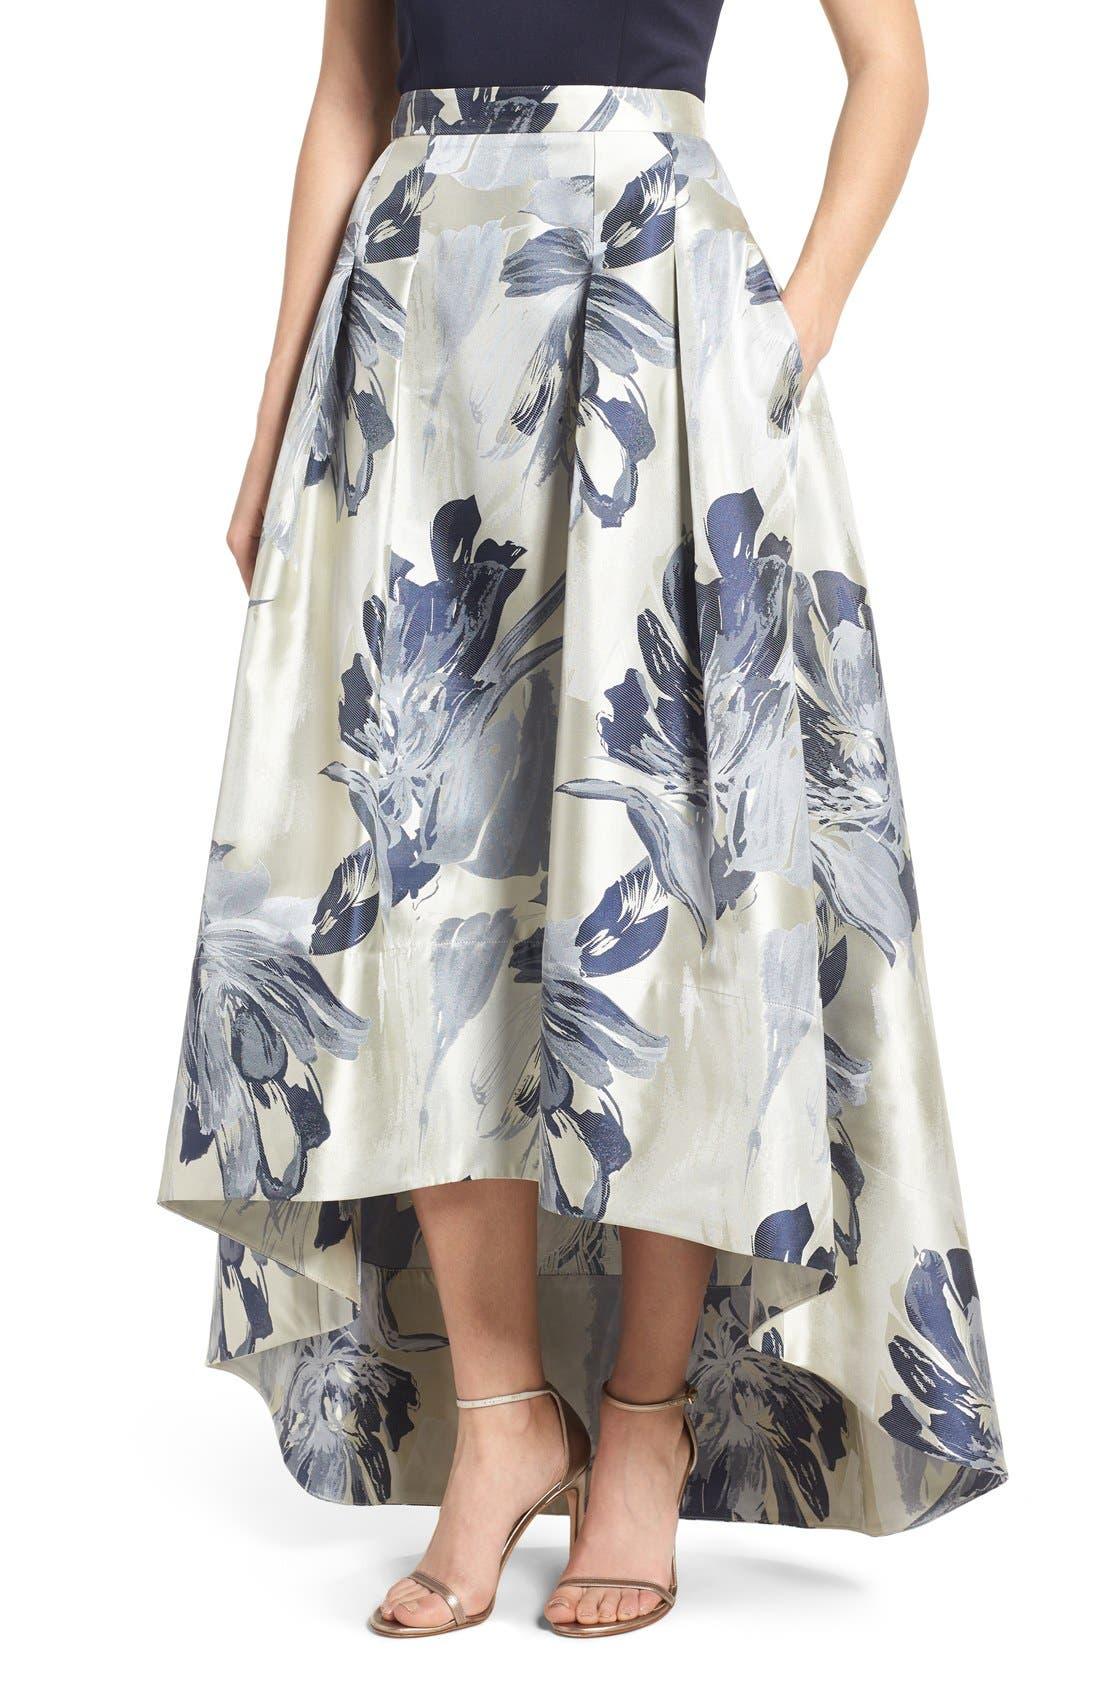 Alternate Image 1 Selected - Eliza J High/Low Ball Skirt